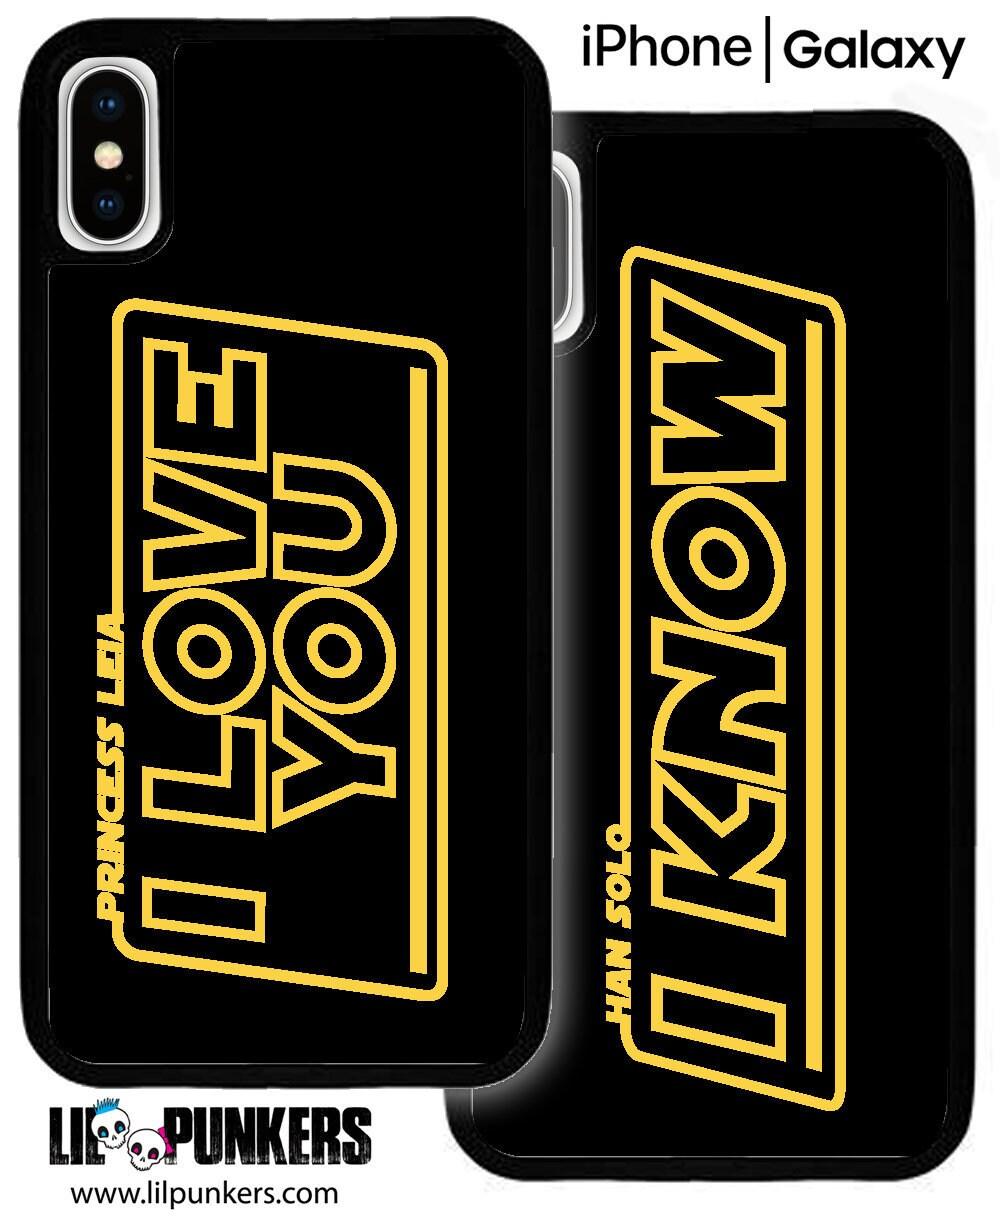 I Love You I Know Han Solo / Princess Leia Matching   Etsy